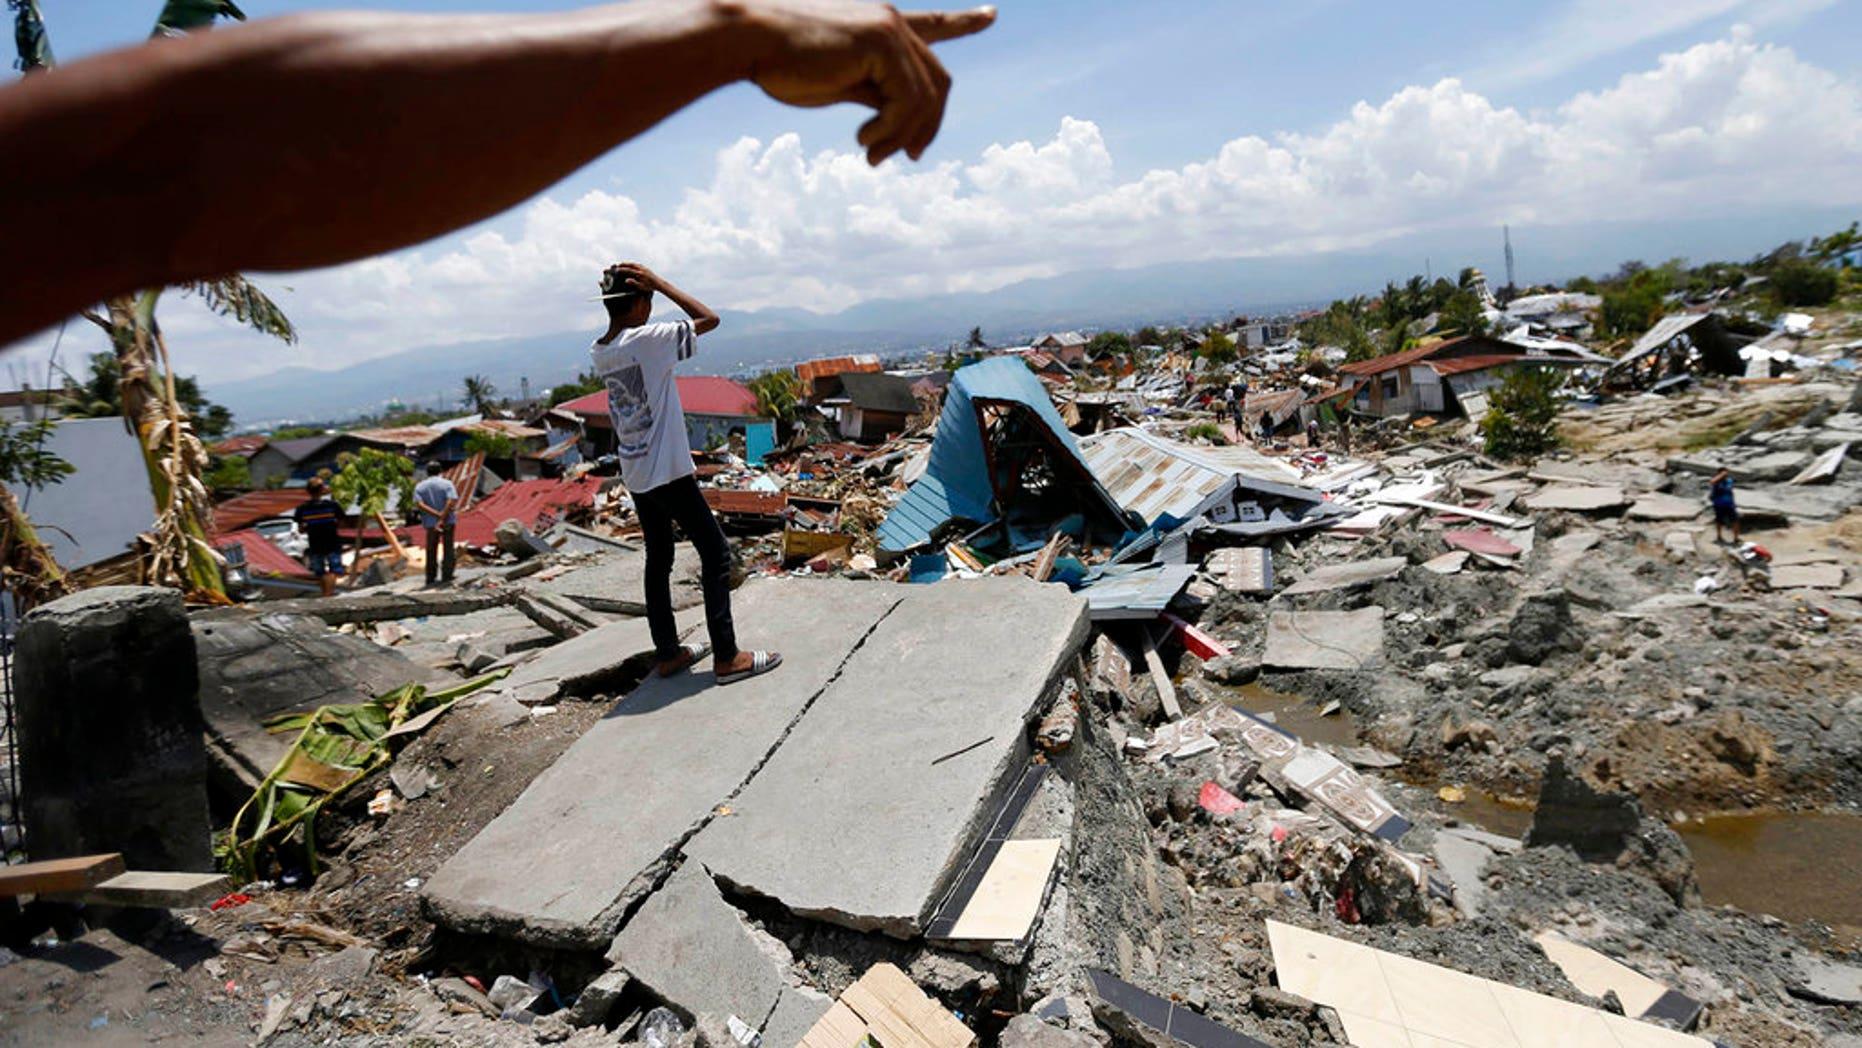 Death toll in Indonesian earthquake, tsunami at 1,234 | Fox News